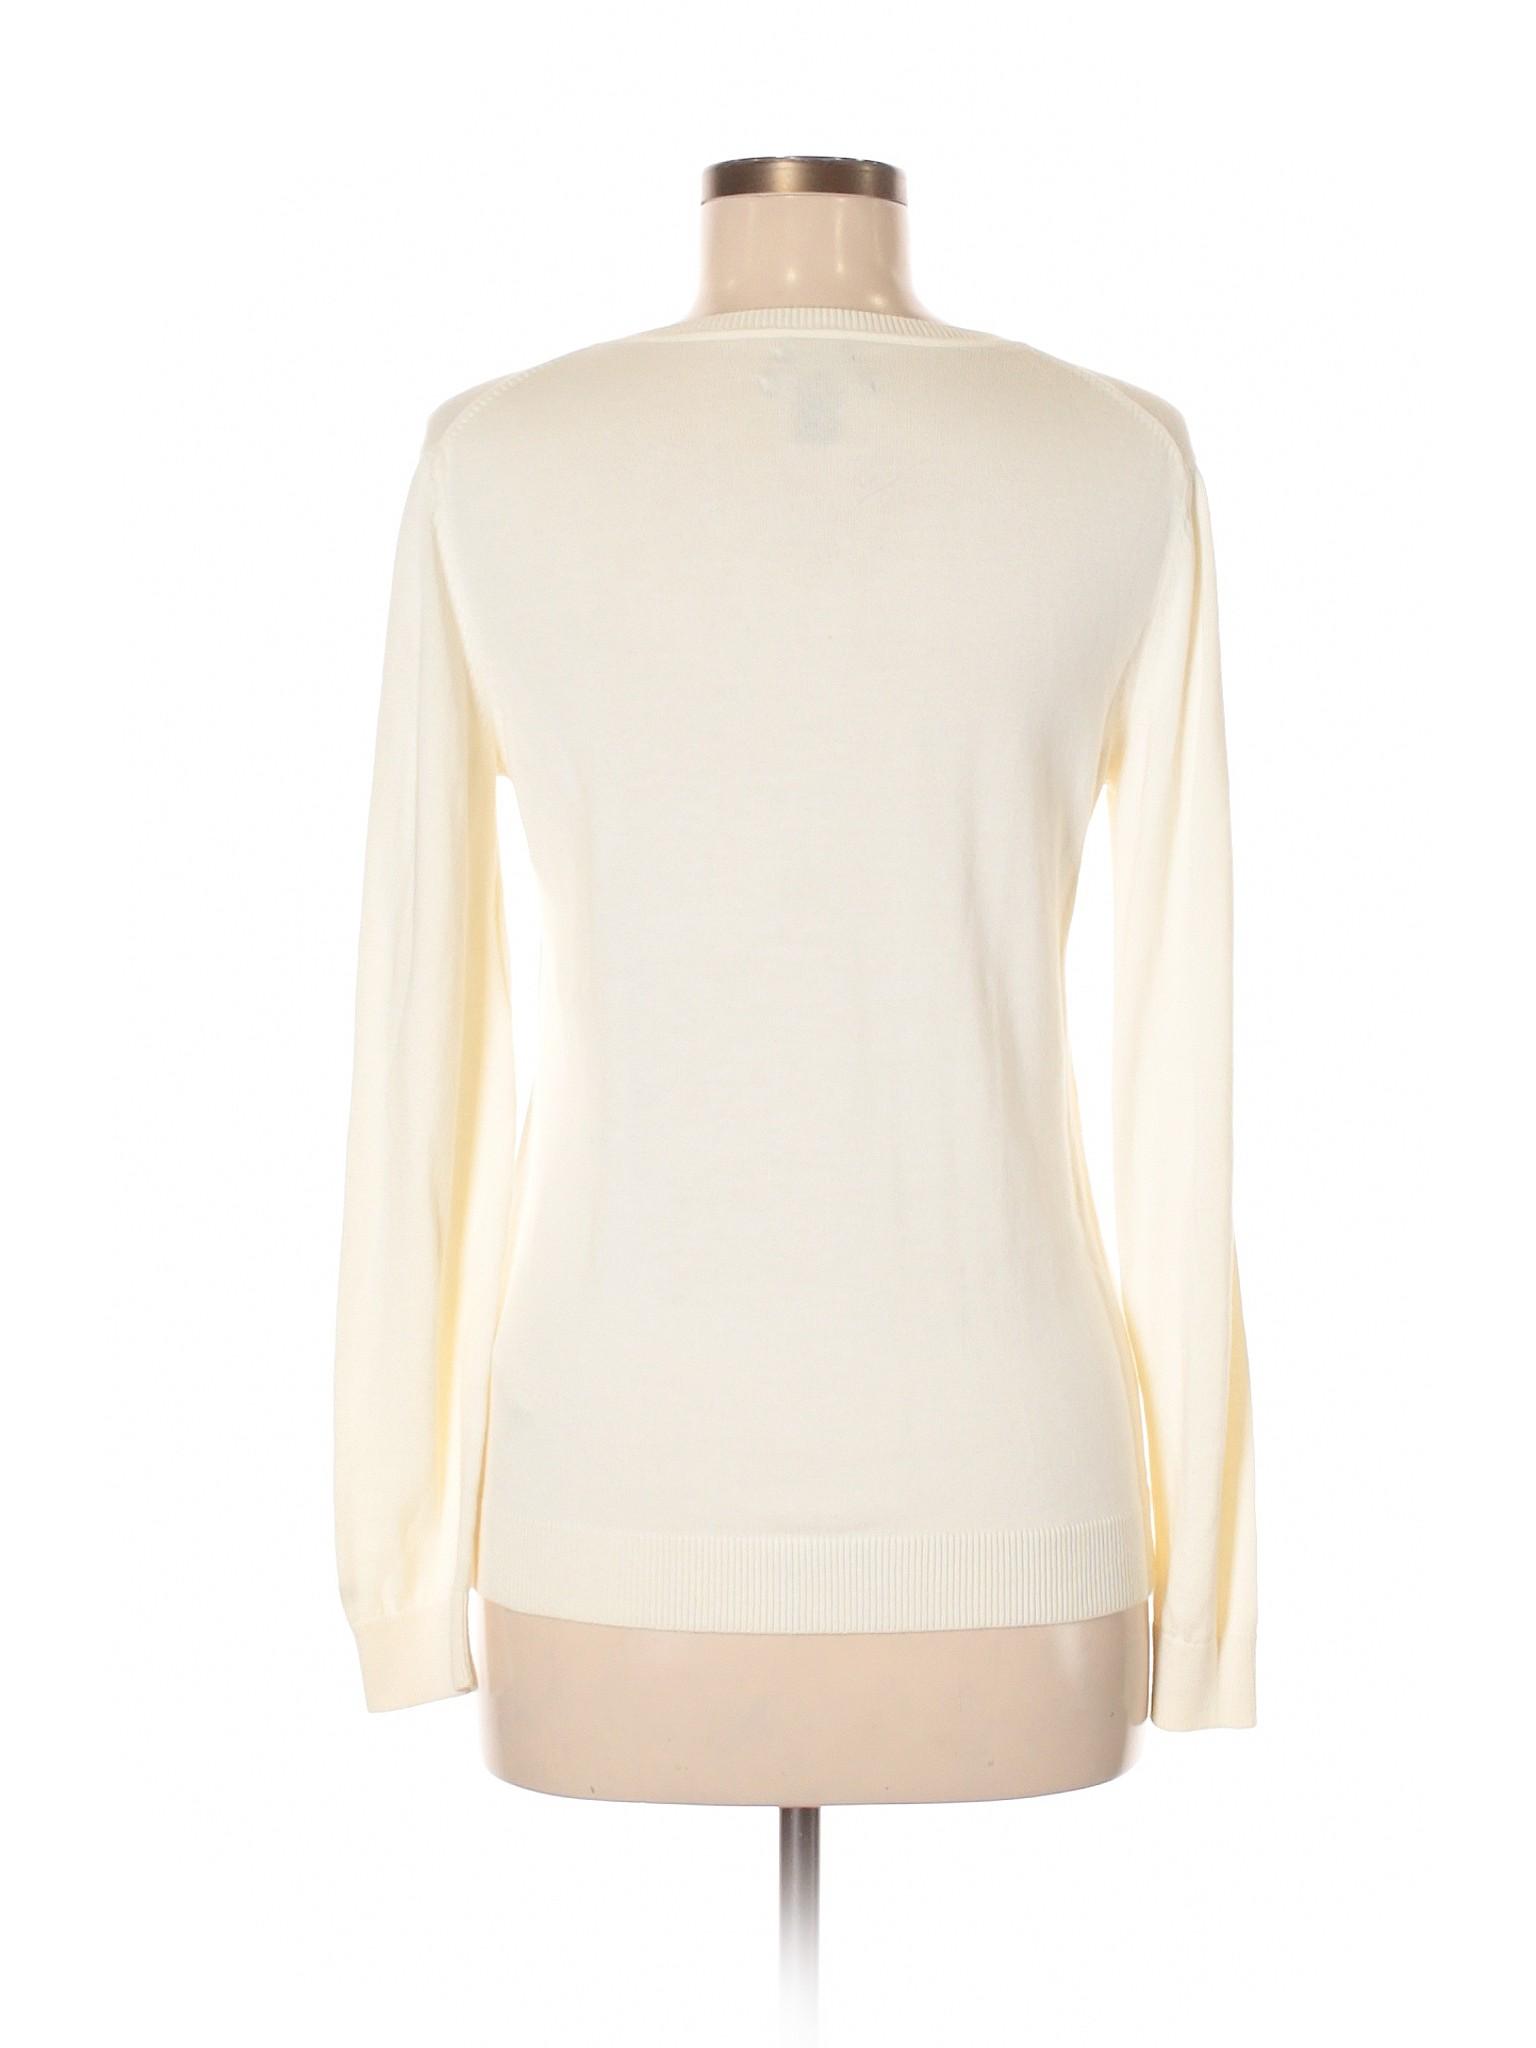 Boutique Boutique Hilfiger Sweater Tommy Tommy Pullover Hilfiger qPwOHE